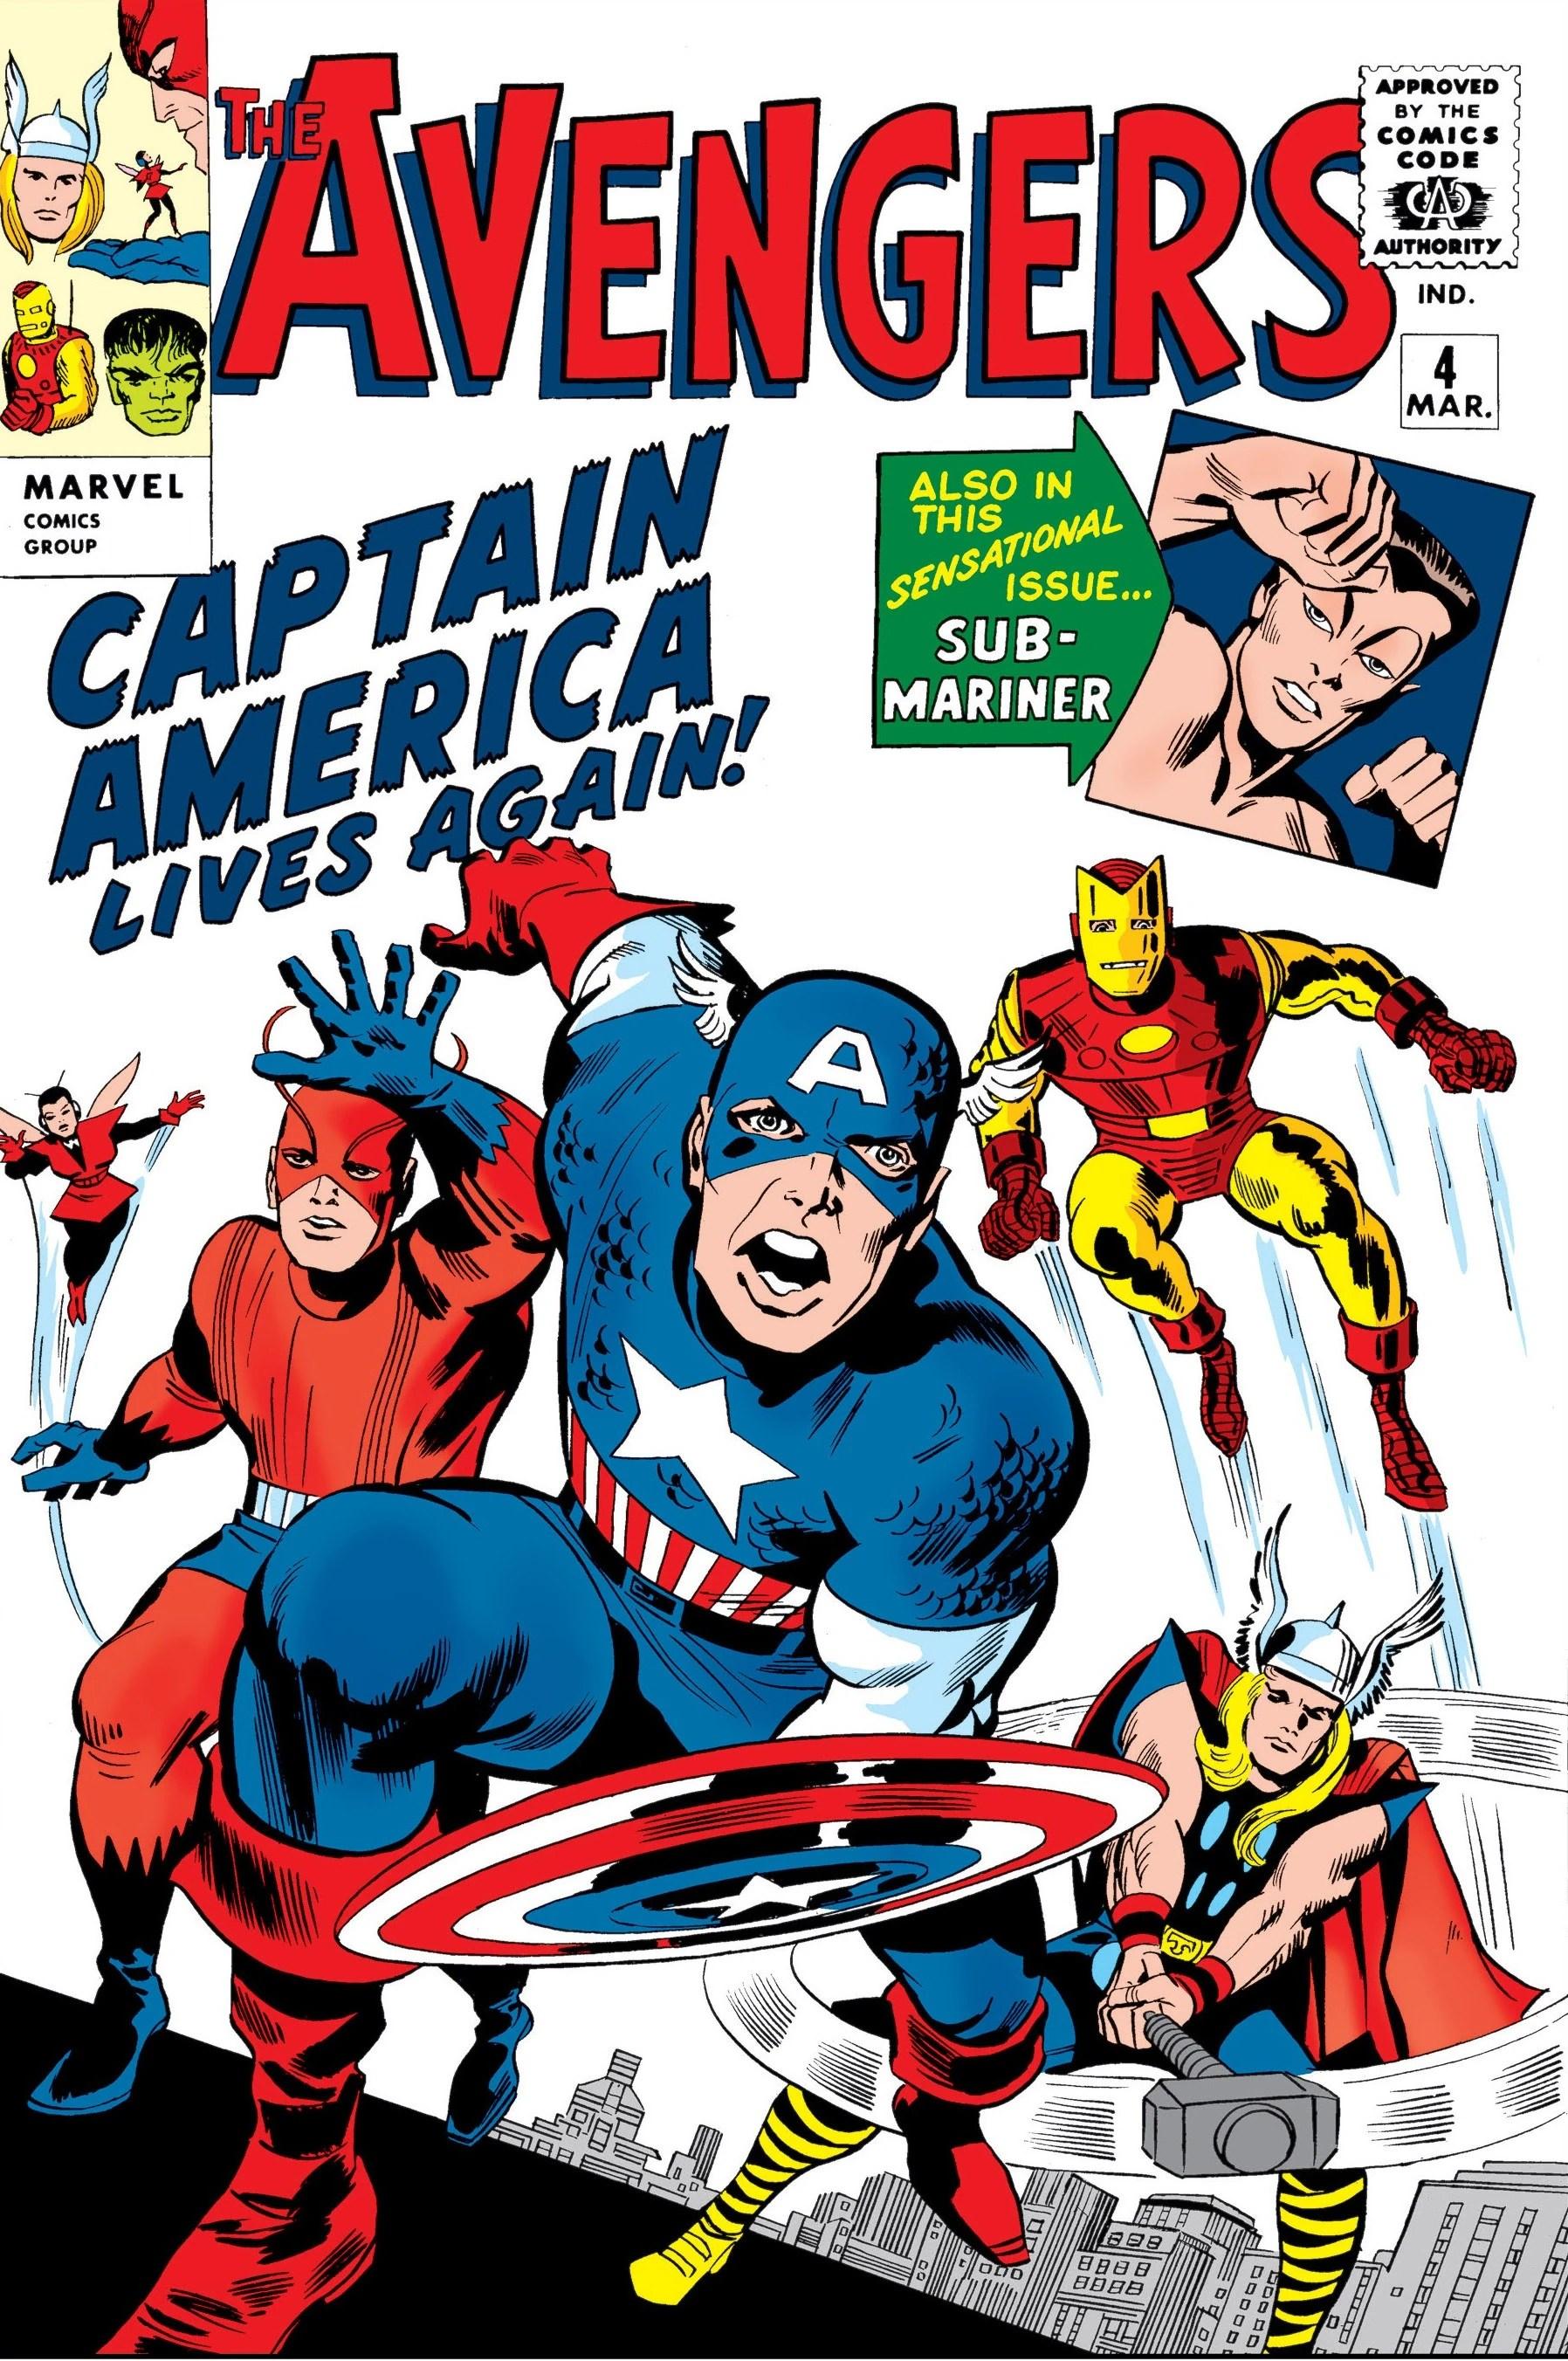 https://i1.wp.com/images.wikia.com/marveldatabase/images/a/a1/Avengers_Vol_1_4.jpg